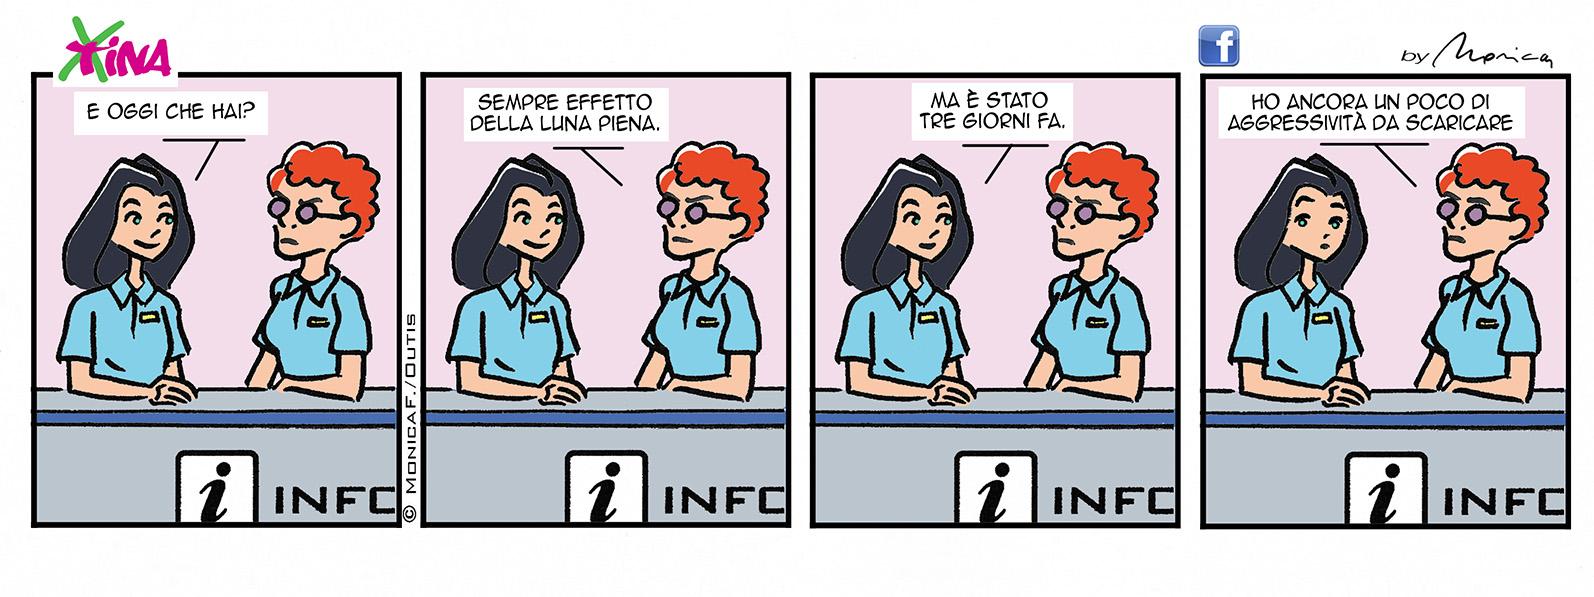 Xtina Comic Strip Full Moon